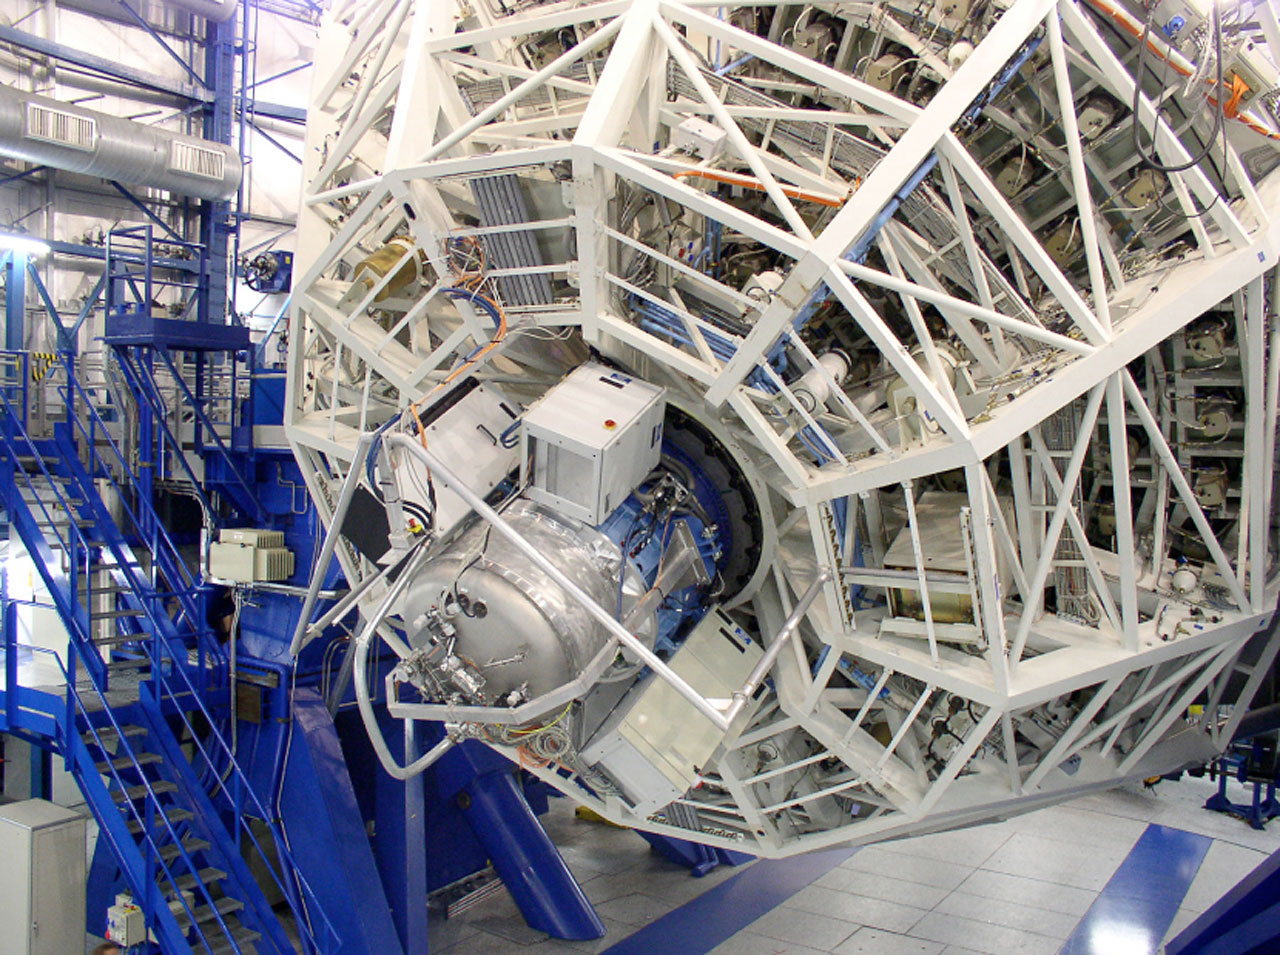 SINFONI undergoing Balancing and Flexure Tests at VLT Yepun